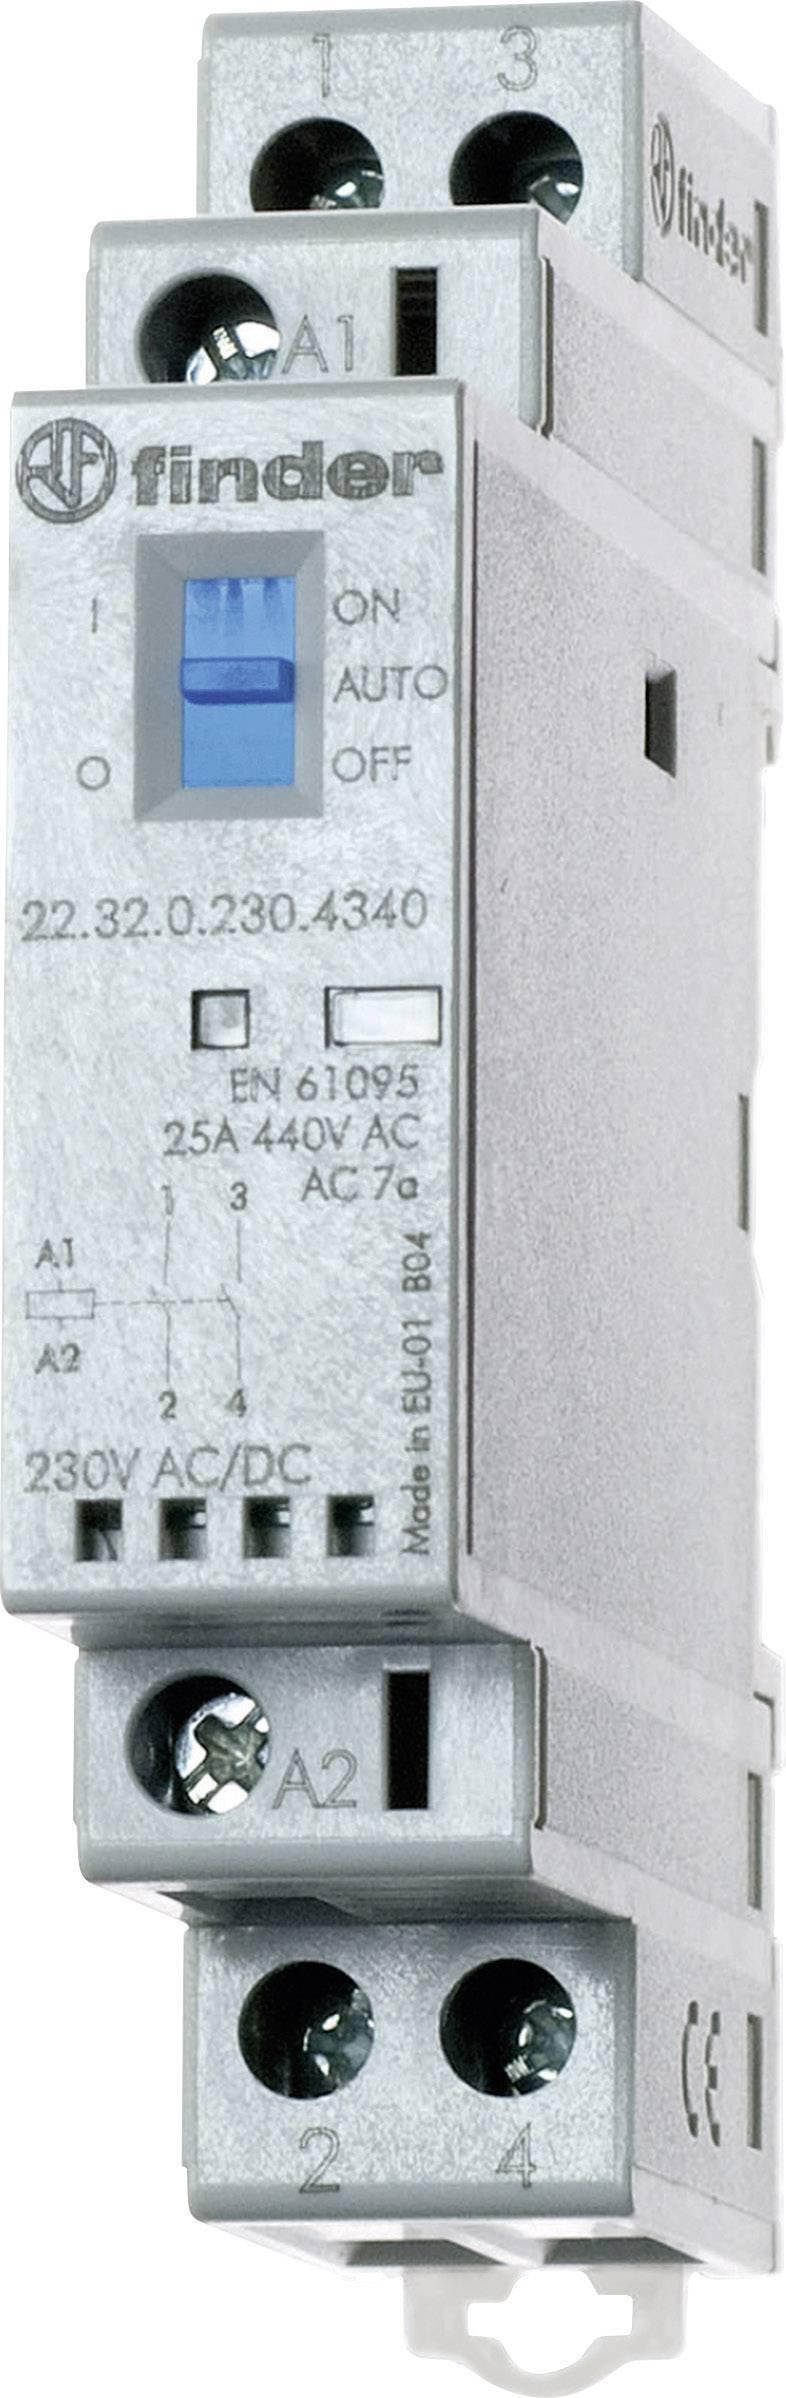 Stykač Finder 22.32.0.230.1440, 230 V/DC, 230 V/AC, 25 A, 1 ks